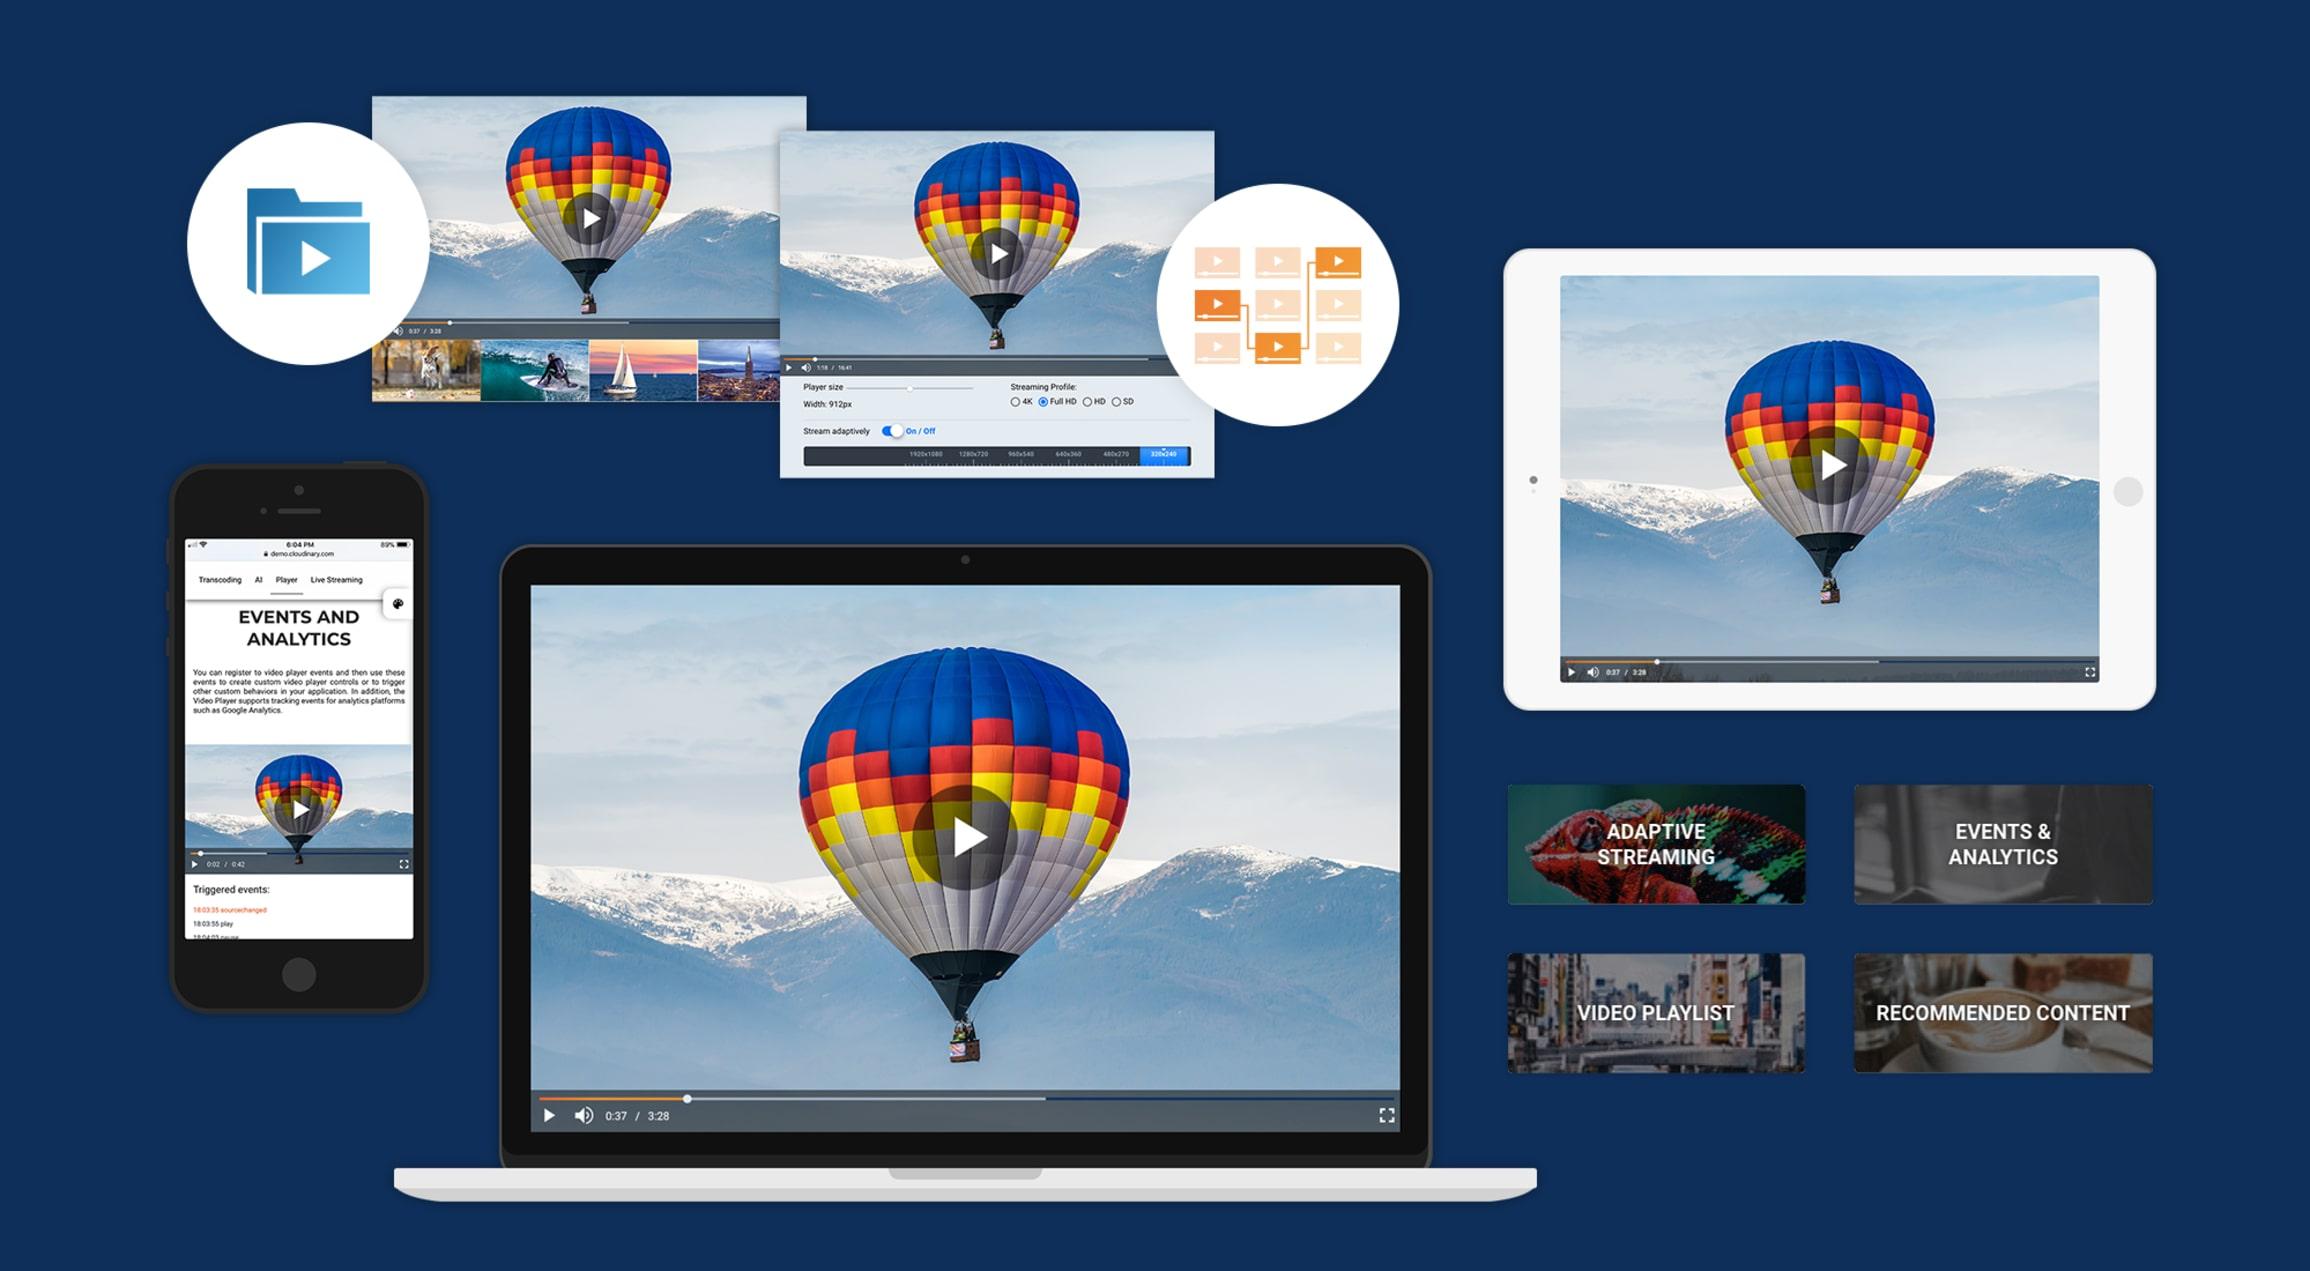 Adaptive HLS Streaming Using the HTML5 Video Tag